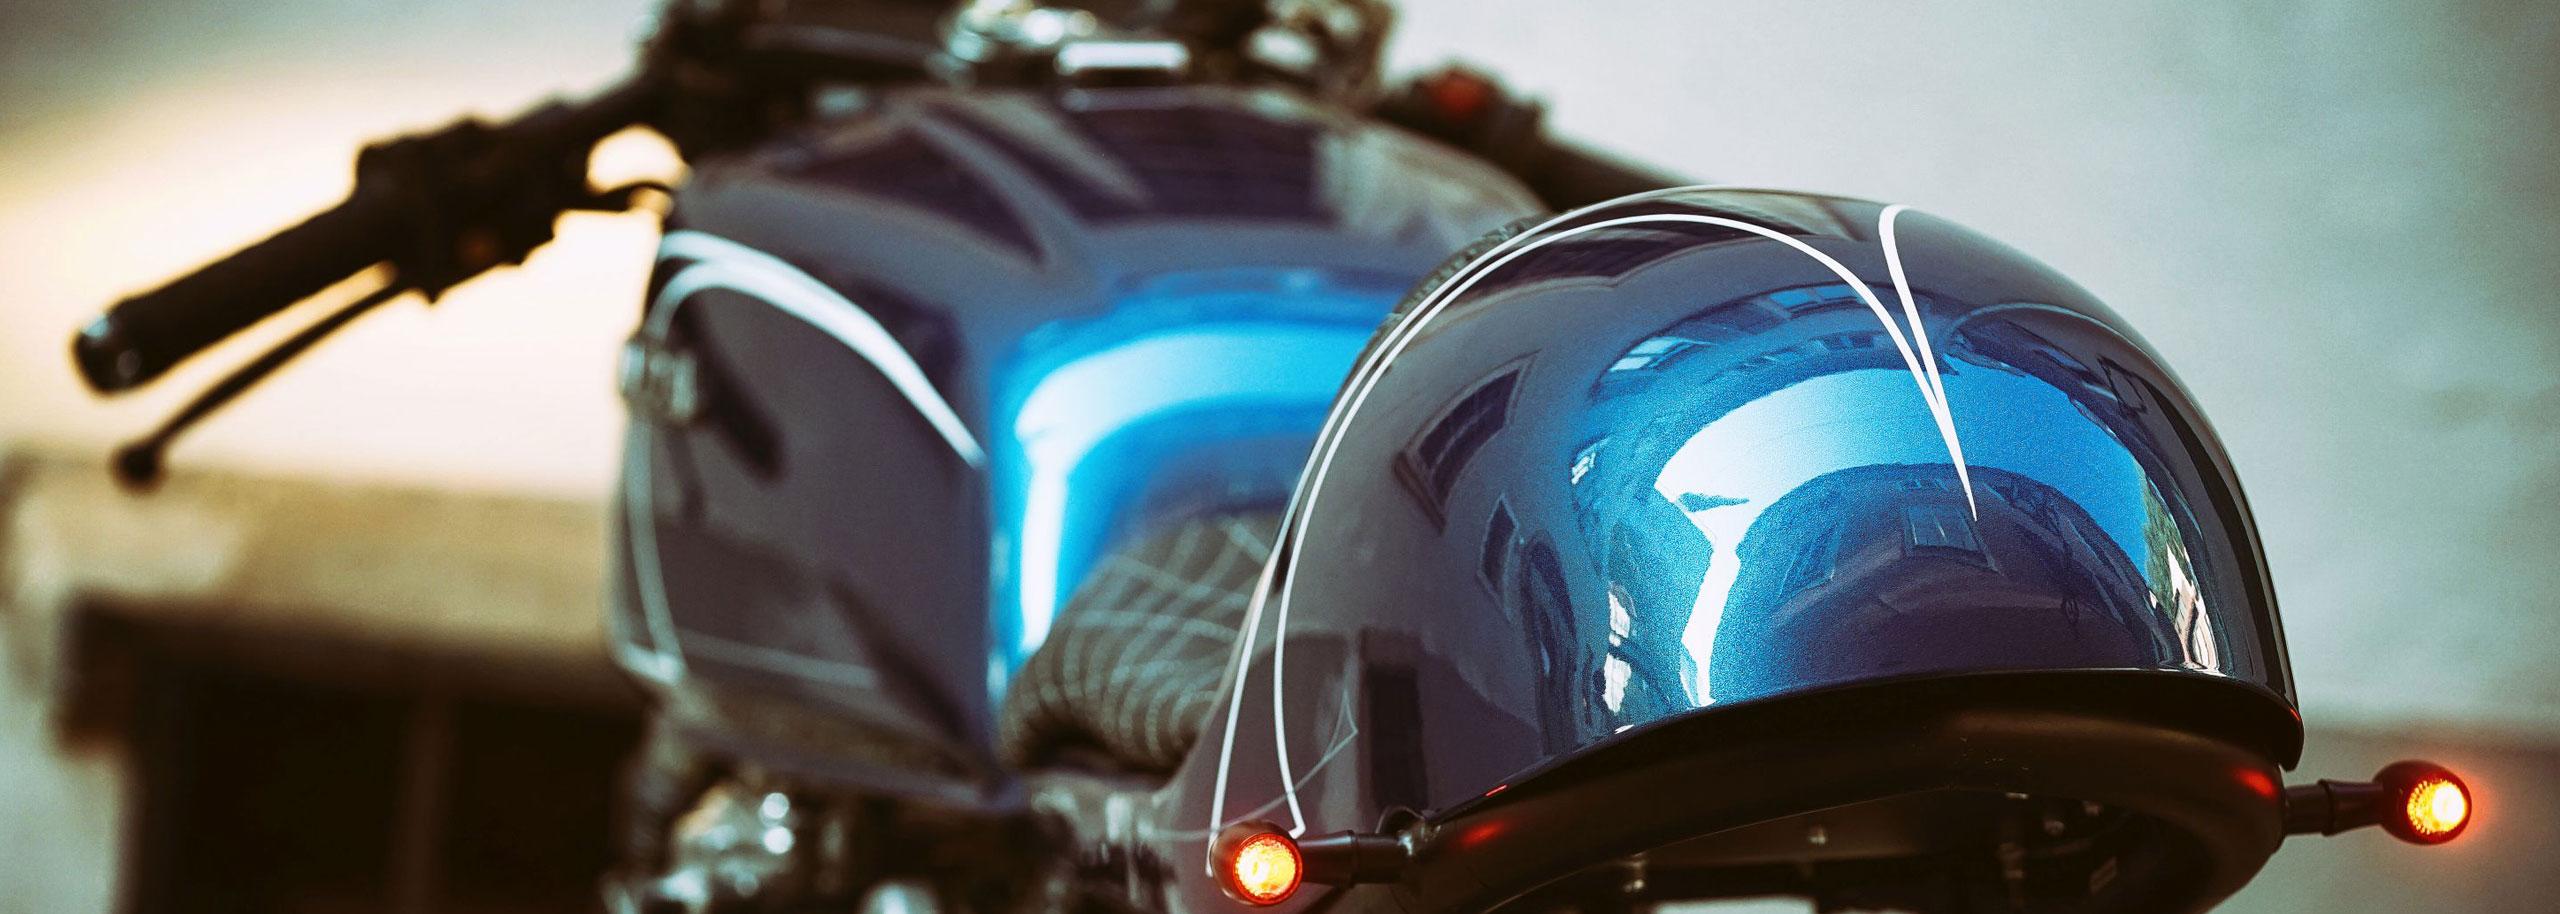 04_TITAN-BLUE-VALENTINE_Honda-Umba-CB-650-Four_Cafe-Racer-Graz-Motorrad-Umbau-Oesterreich-Vintage_Custom-Bikes-Einzigartiges-Design